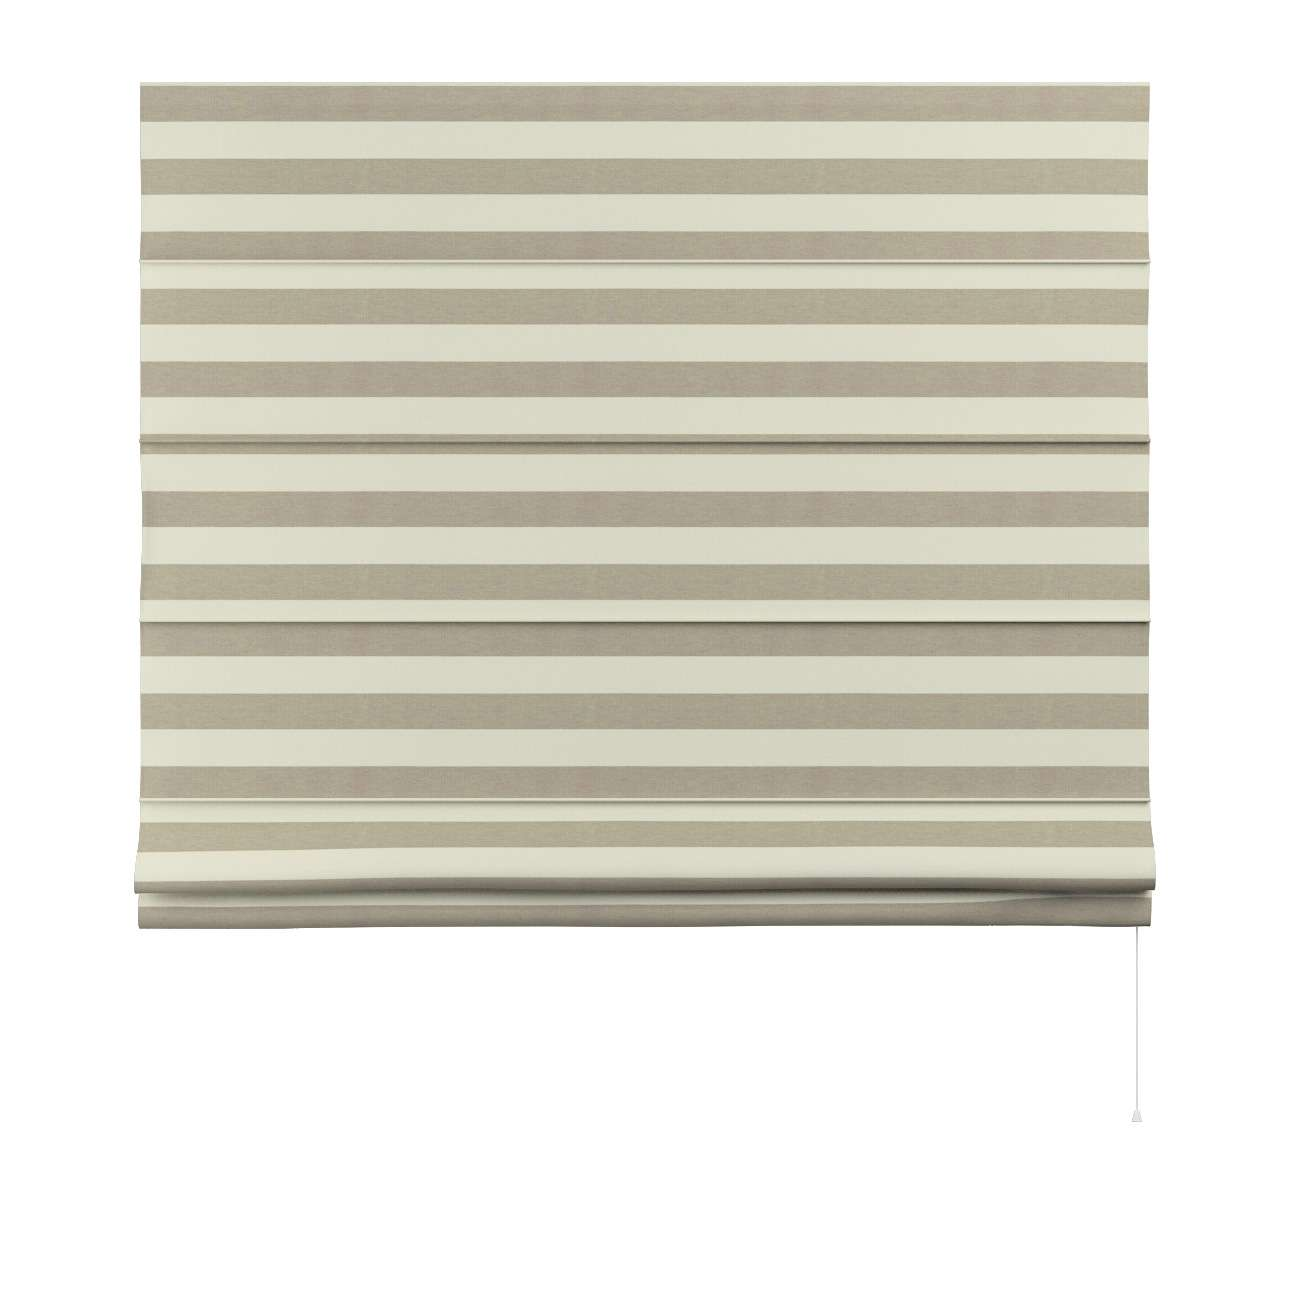 Roleta rzymska Capri w kolekcji Quadro, tkanina: 142-73